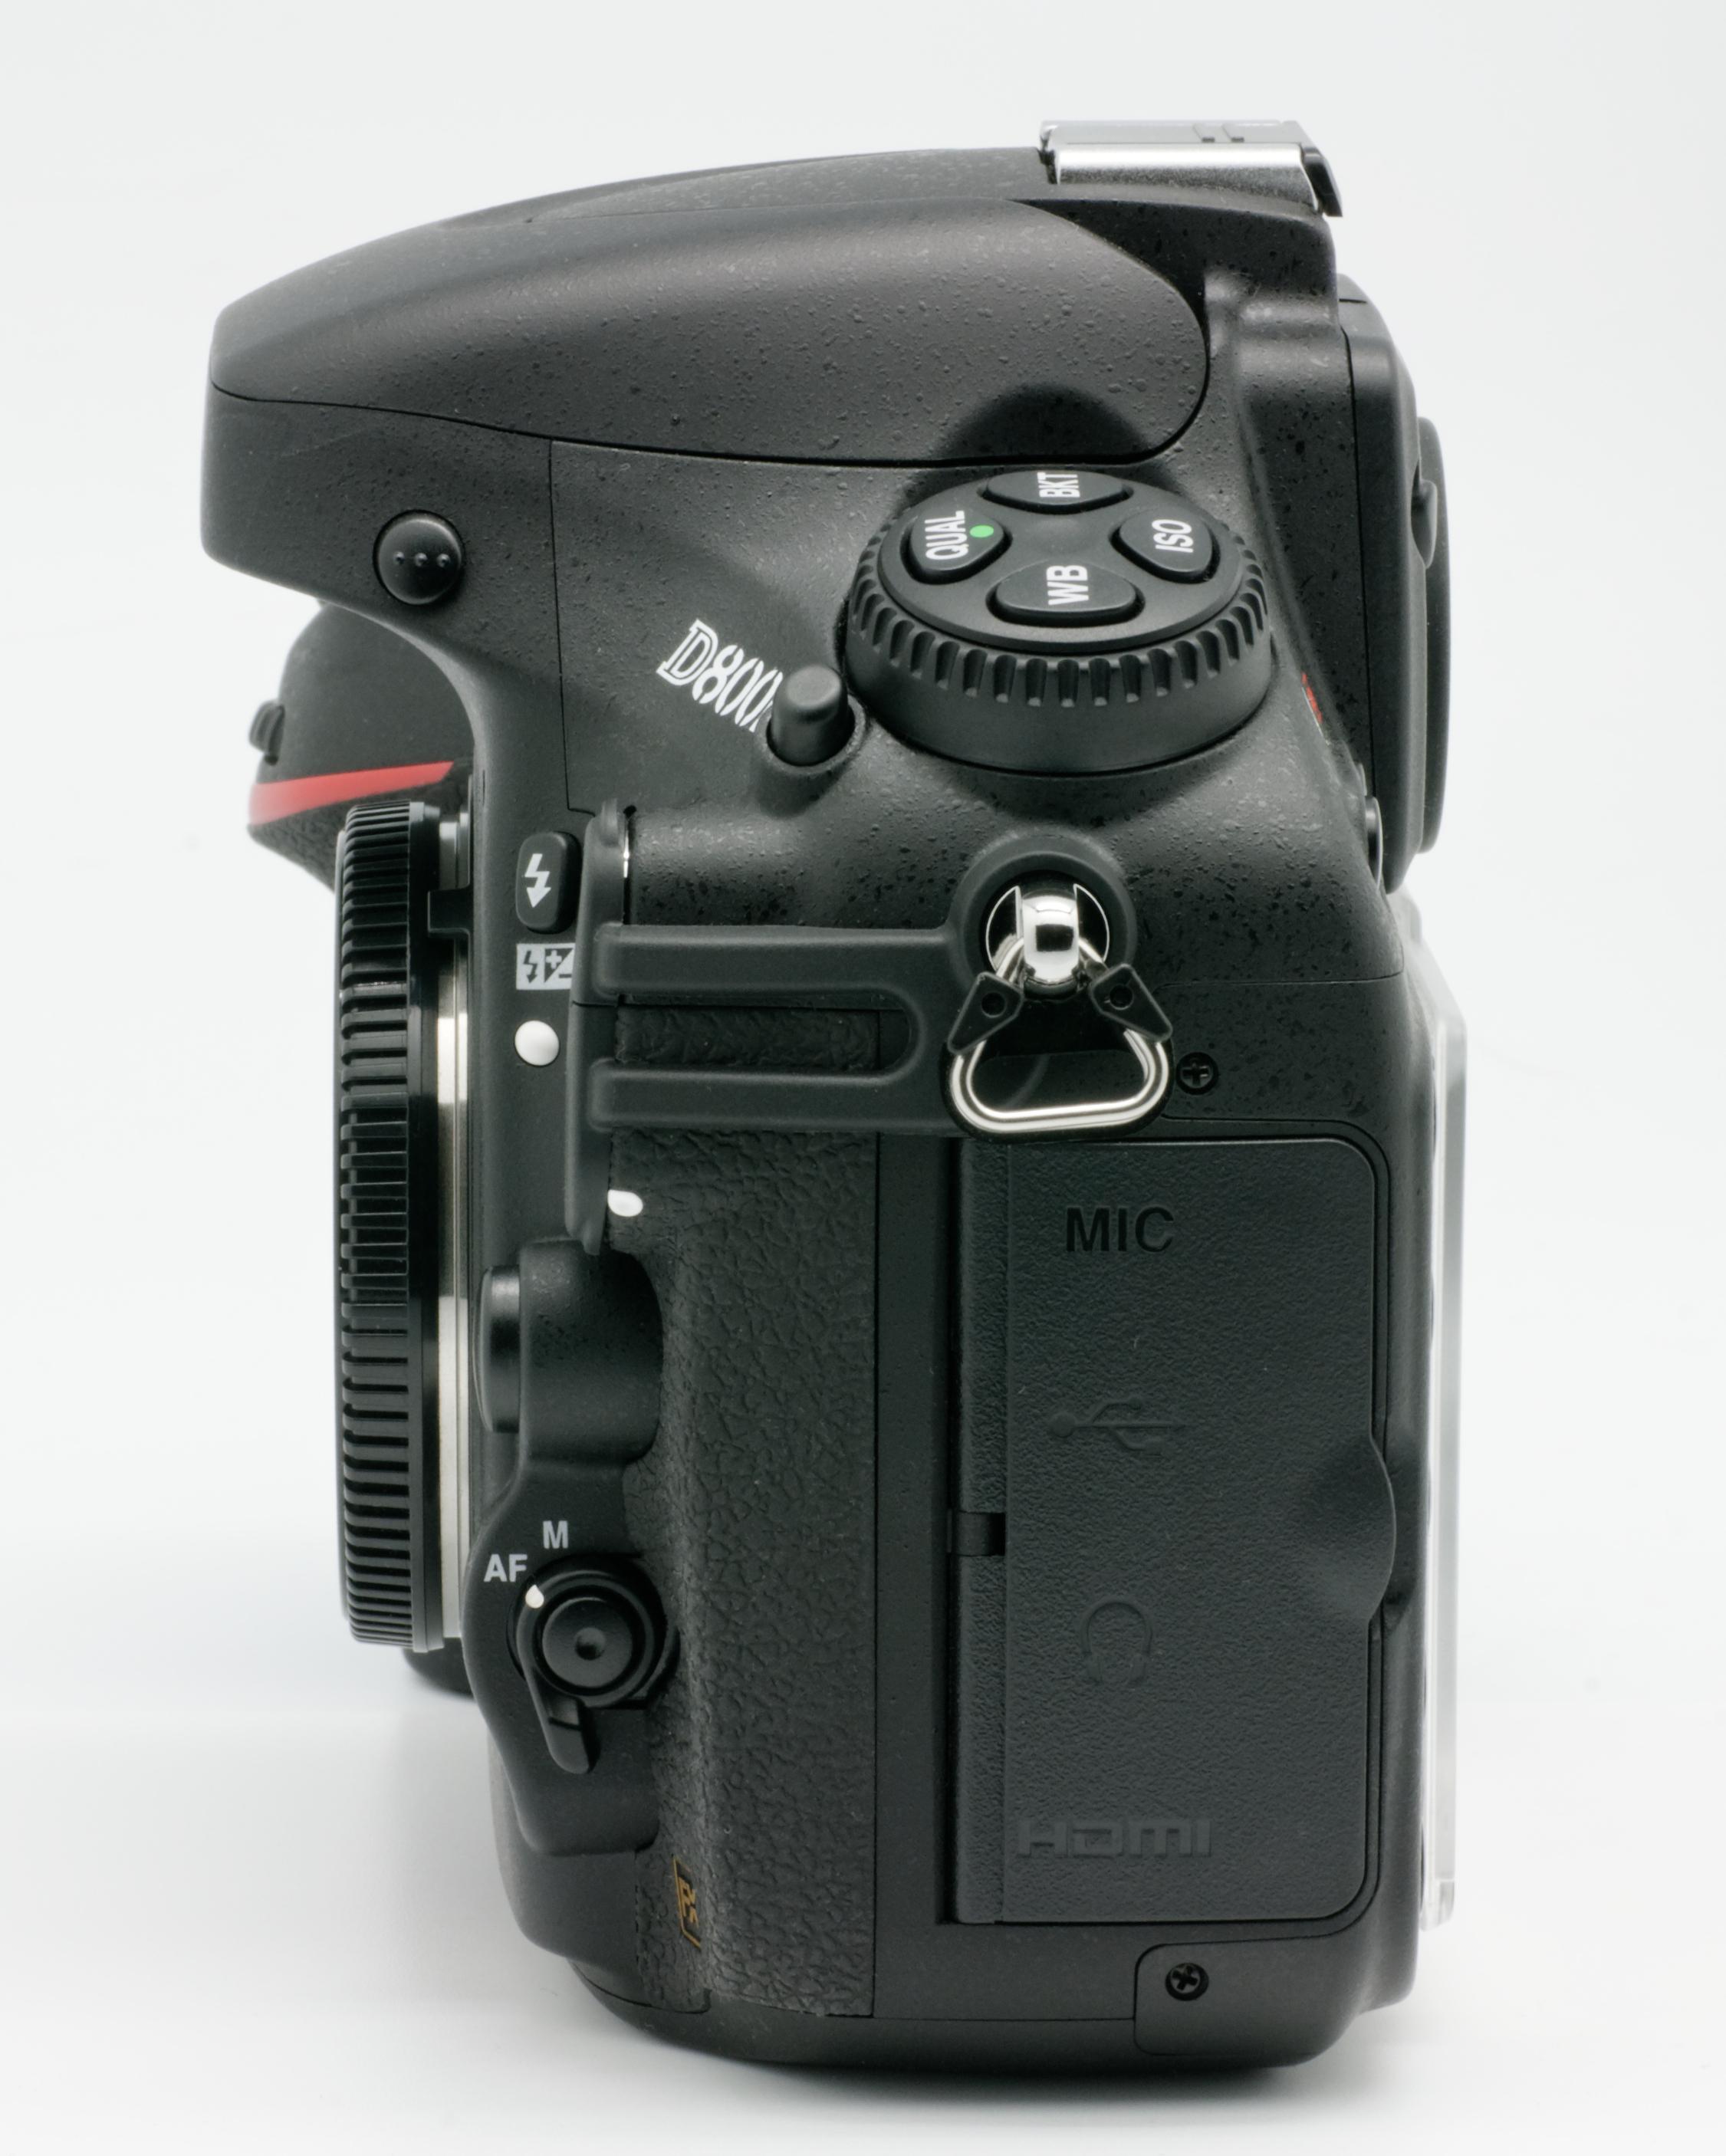 Nikon_D800E_body_only_05.jpg